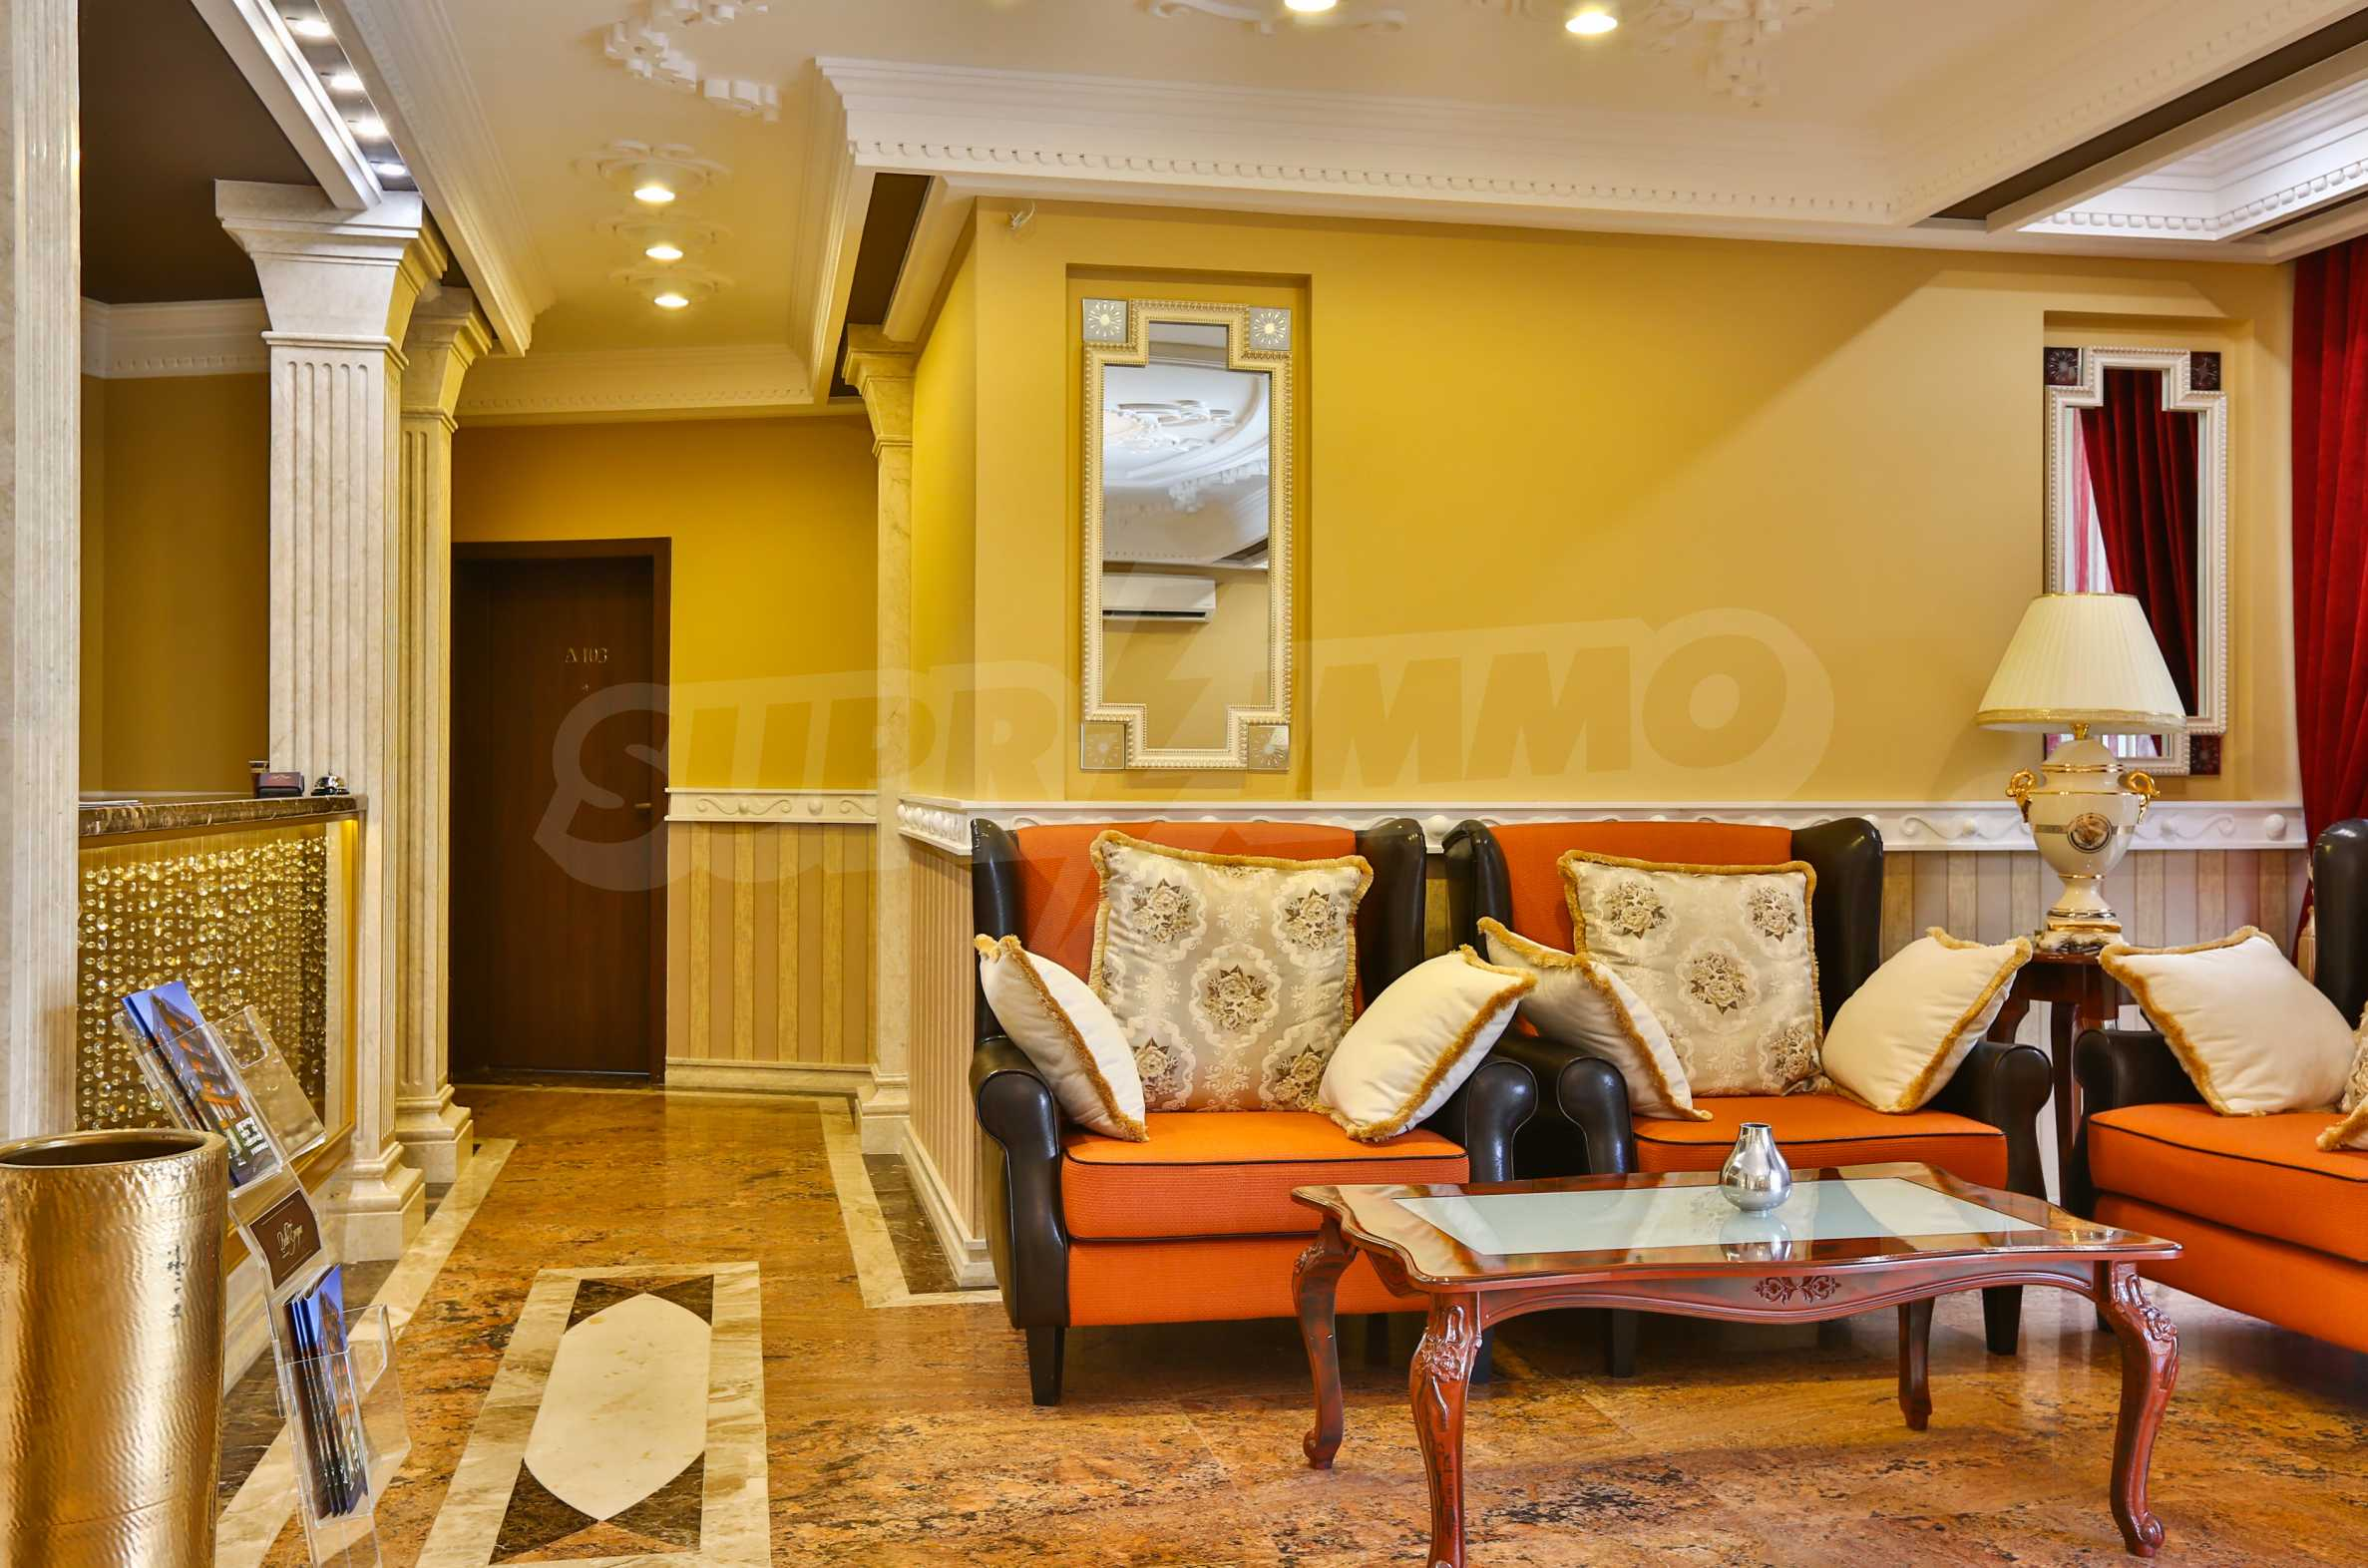 Exclusive 2-bedroom beachfront apartment in the prestigious Belle Époque Beach Residence 31